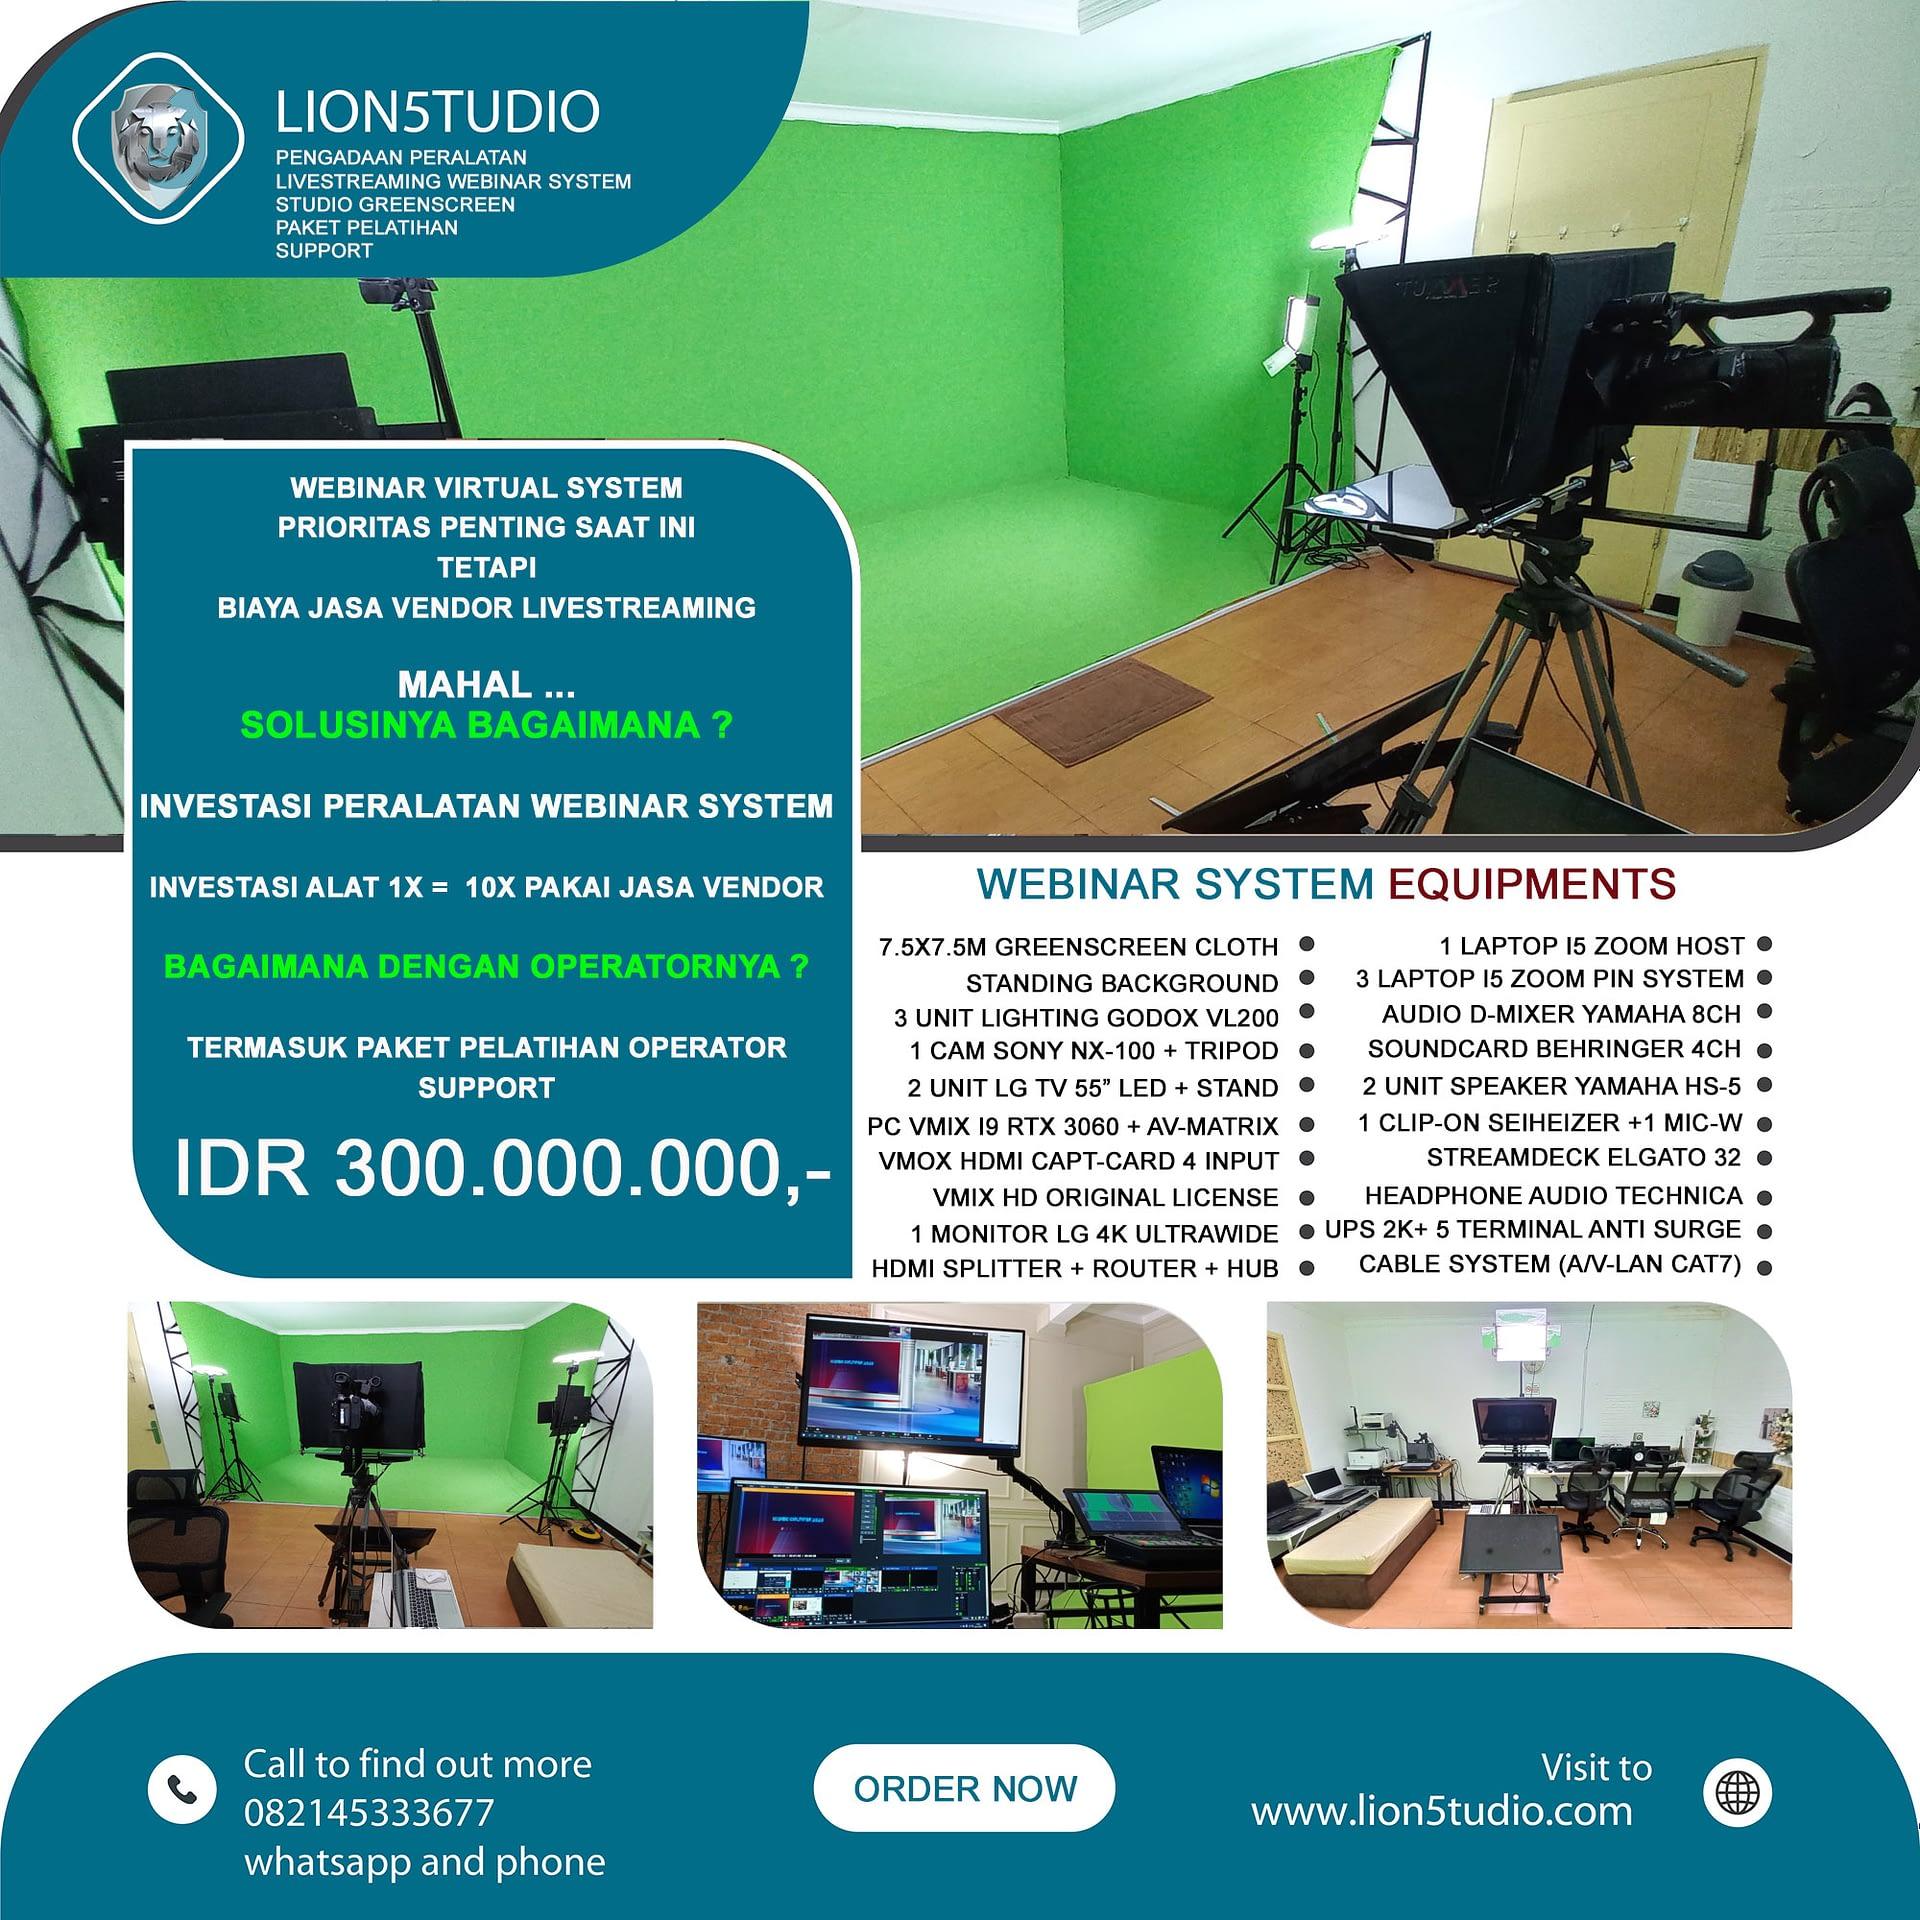 Pengadaan Peralatan Webinar Livestreaming System + Studio Greenscreen Murah